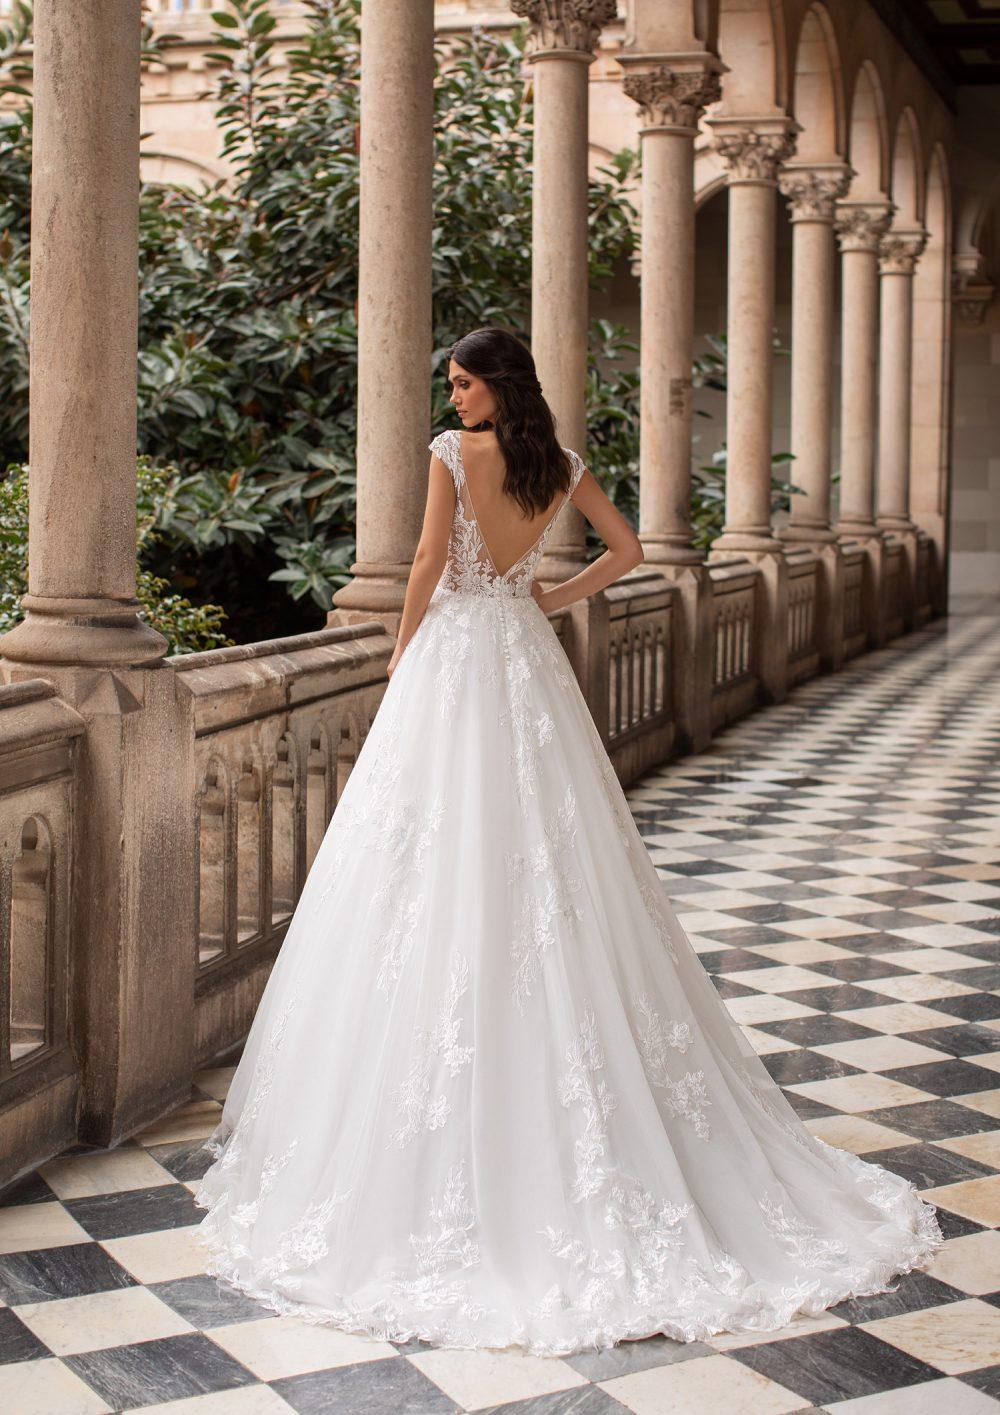 Mariages: abito da sposa Pronovias 2021 a Vicenza, Verona, Padova, Veneto GRIFFITH